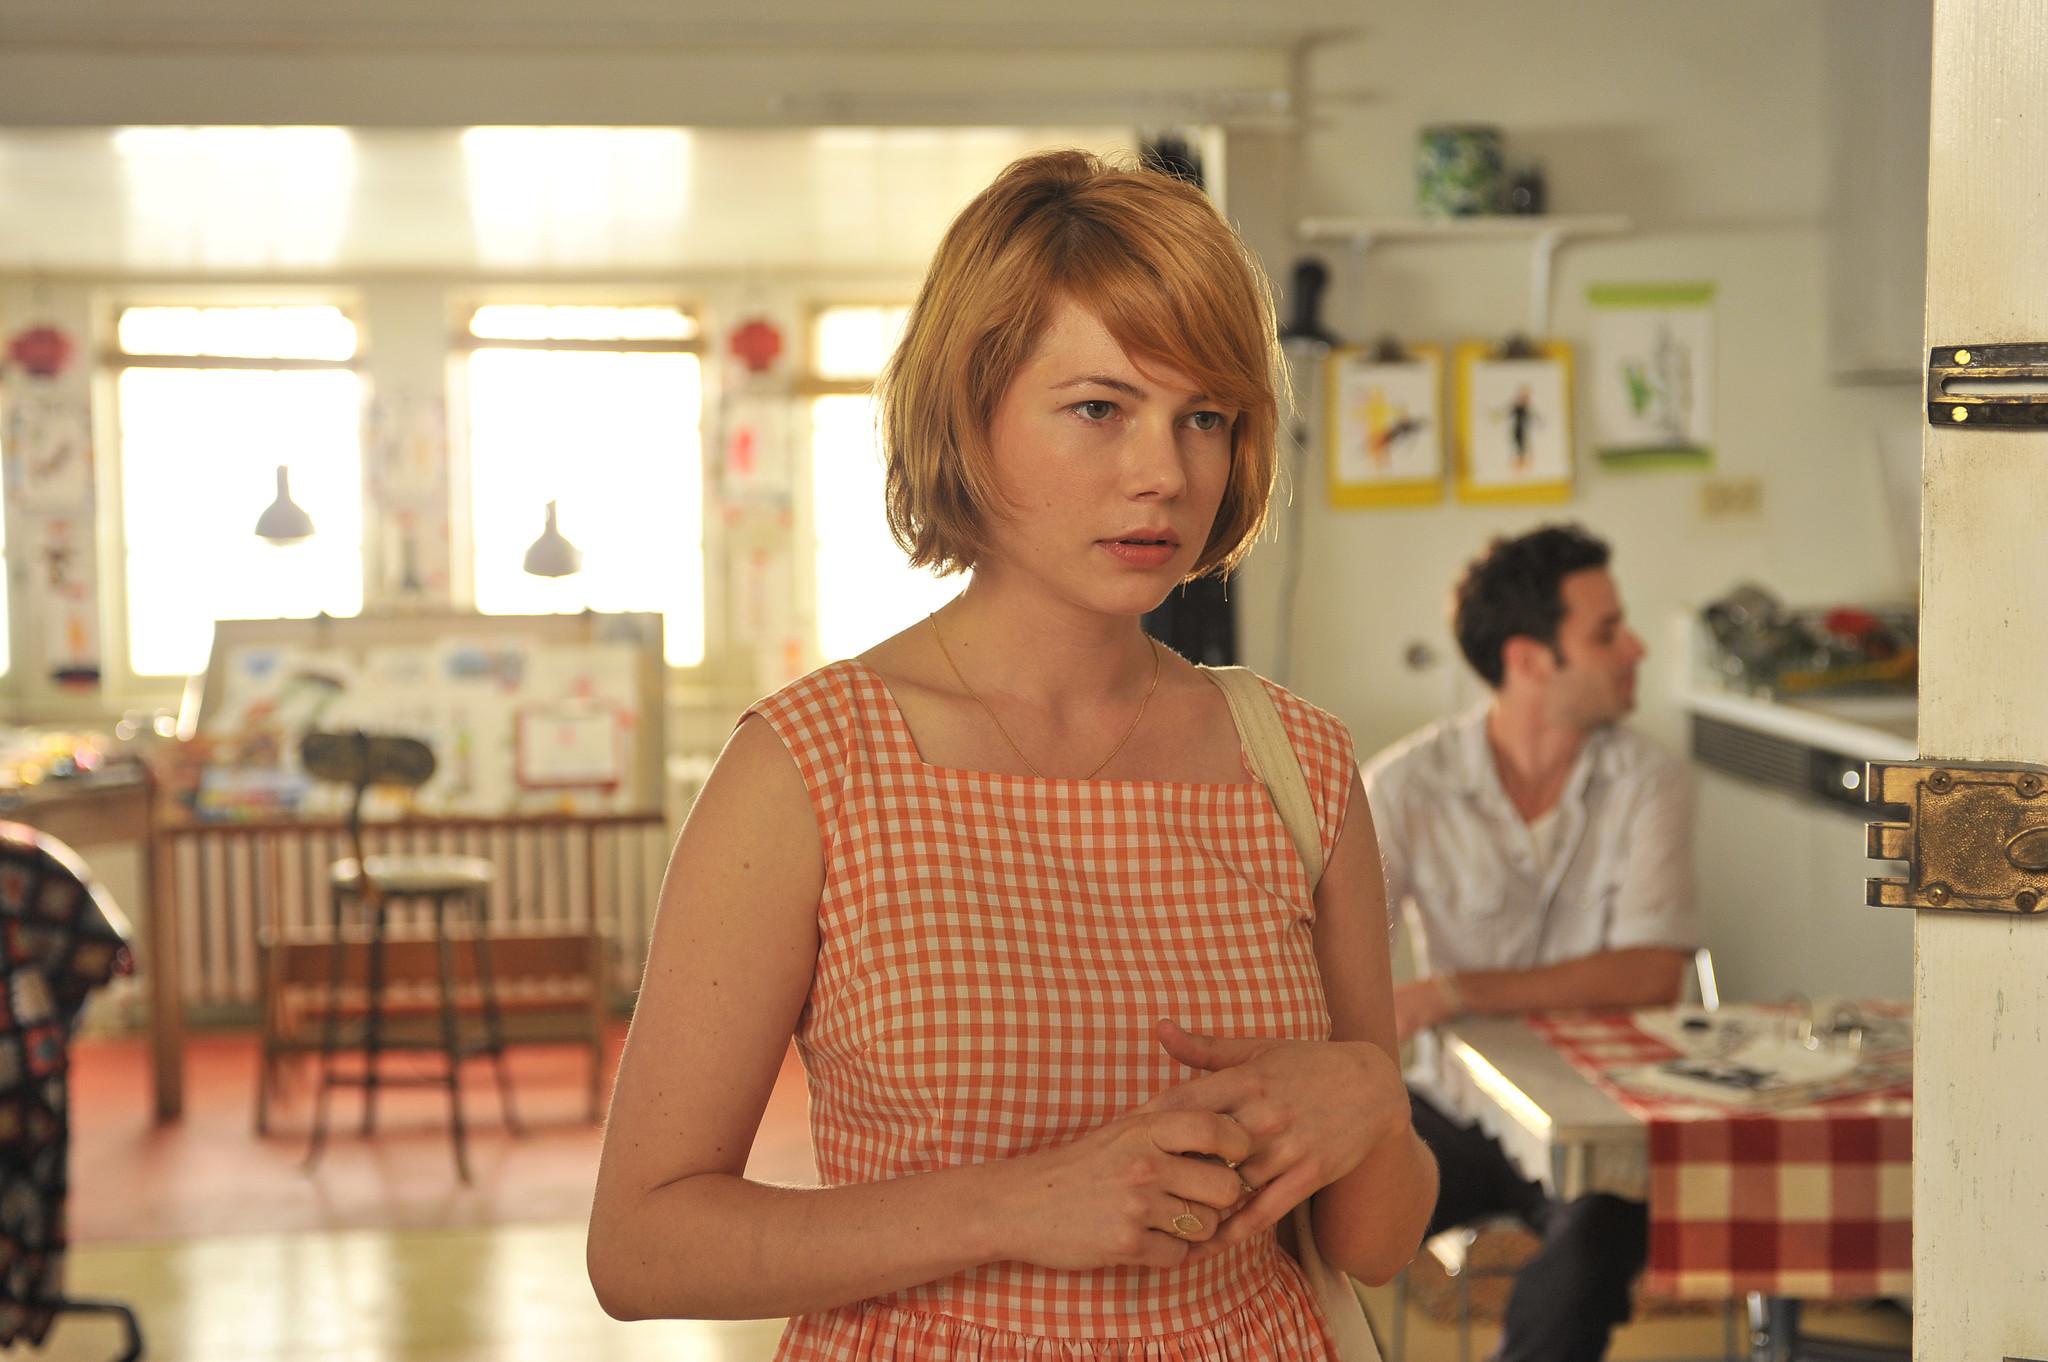 Michelle Williams in Take This Waltz (2011)